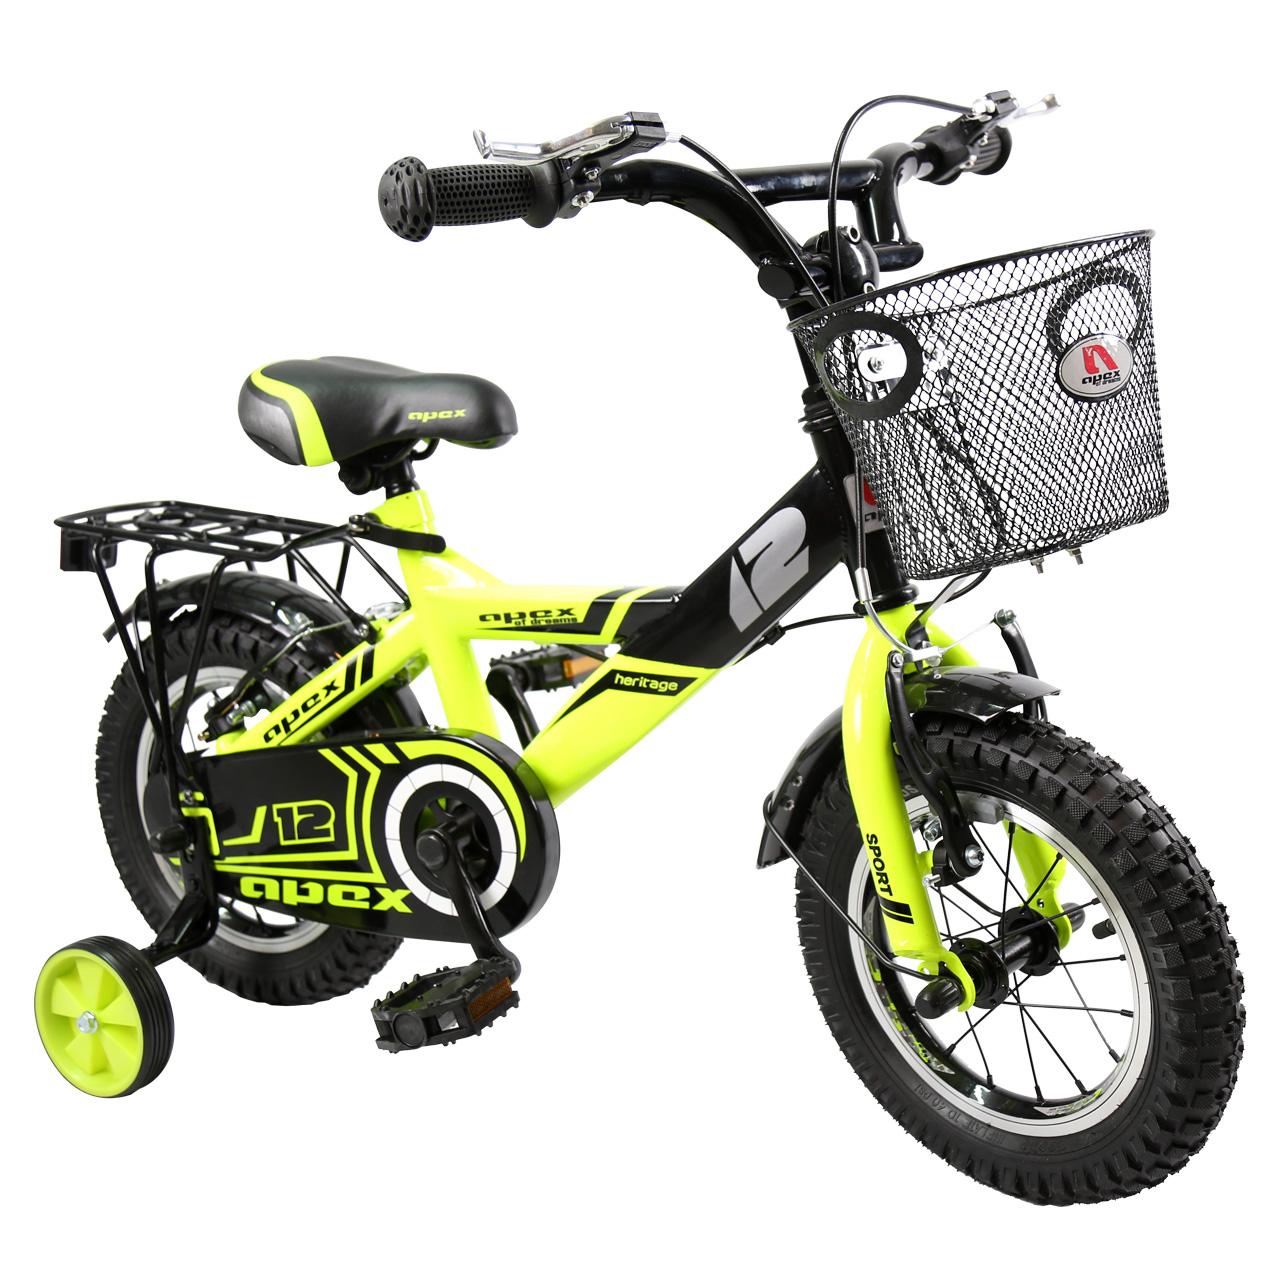 دوچرخه کوهستان اپکس مدل Heritage GR سایز 12